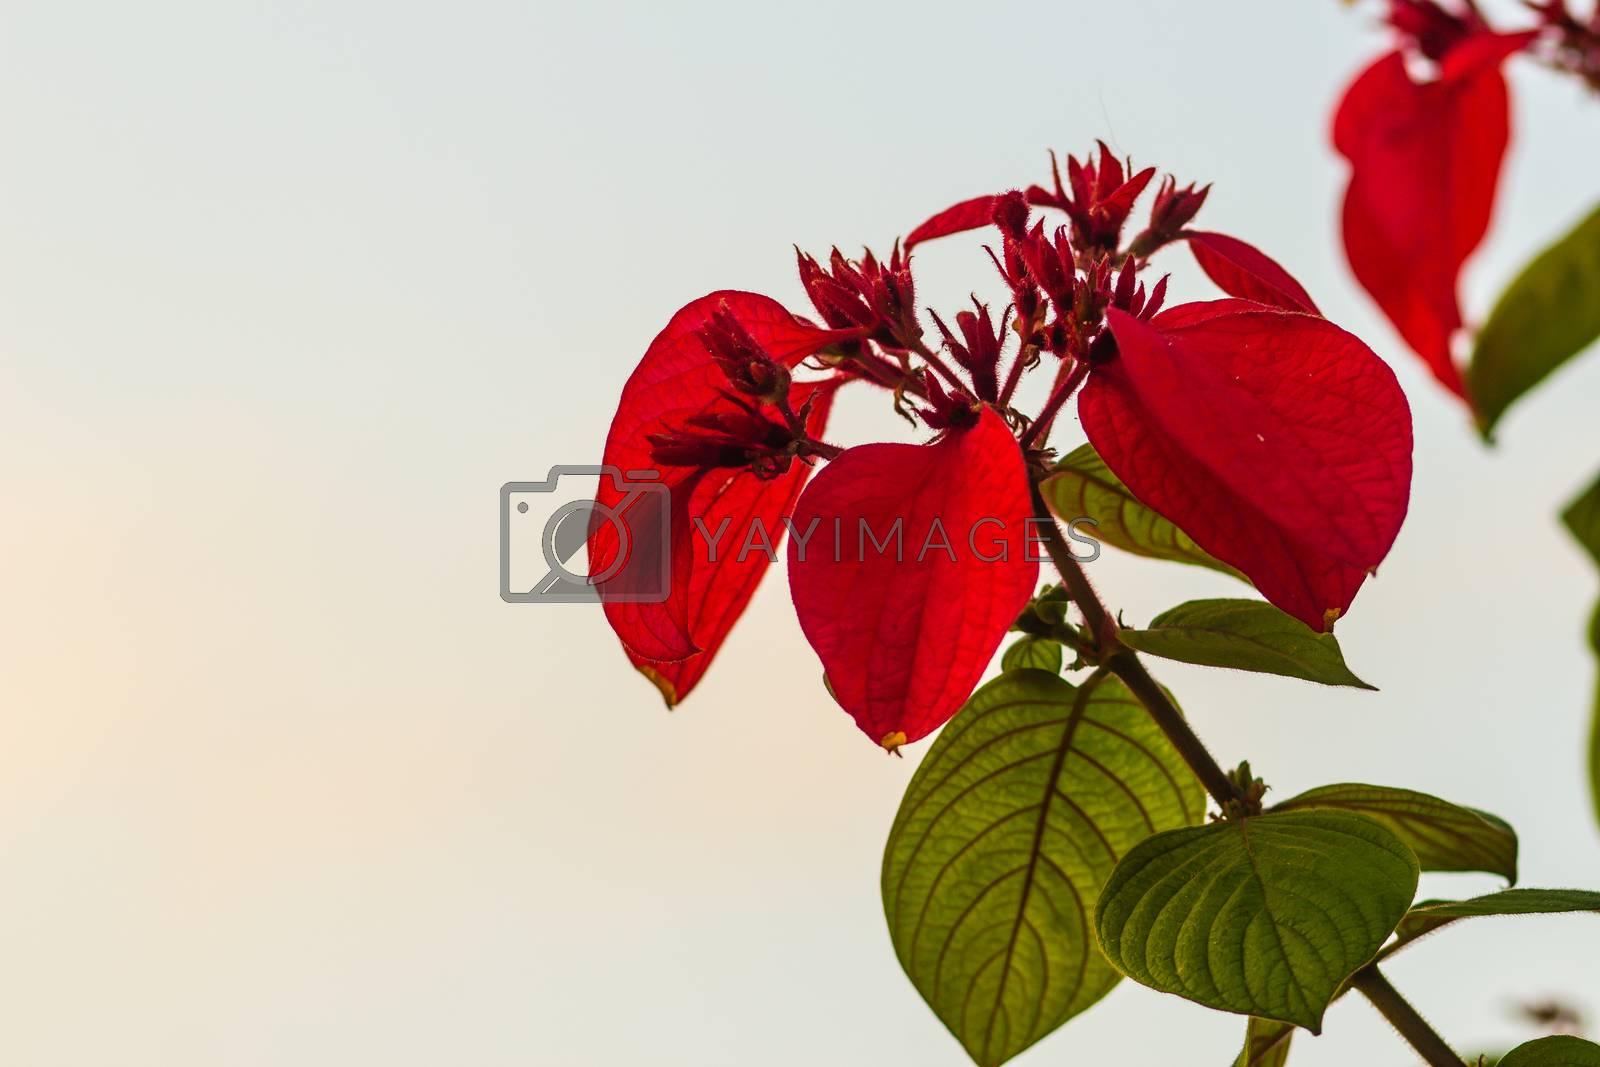 Red Ashanti blood flower (Mussaenda erythrophylla) green leaves background. Mussaenda erythrophylla also know as Ashanti blood, red flag bush and tropical dogwood, is an evergreen West African shrub.